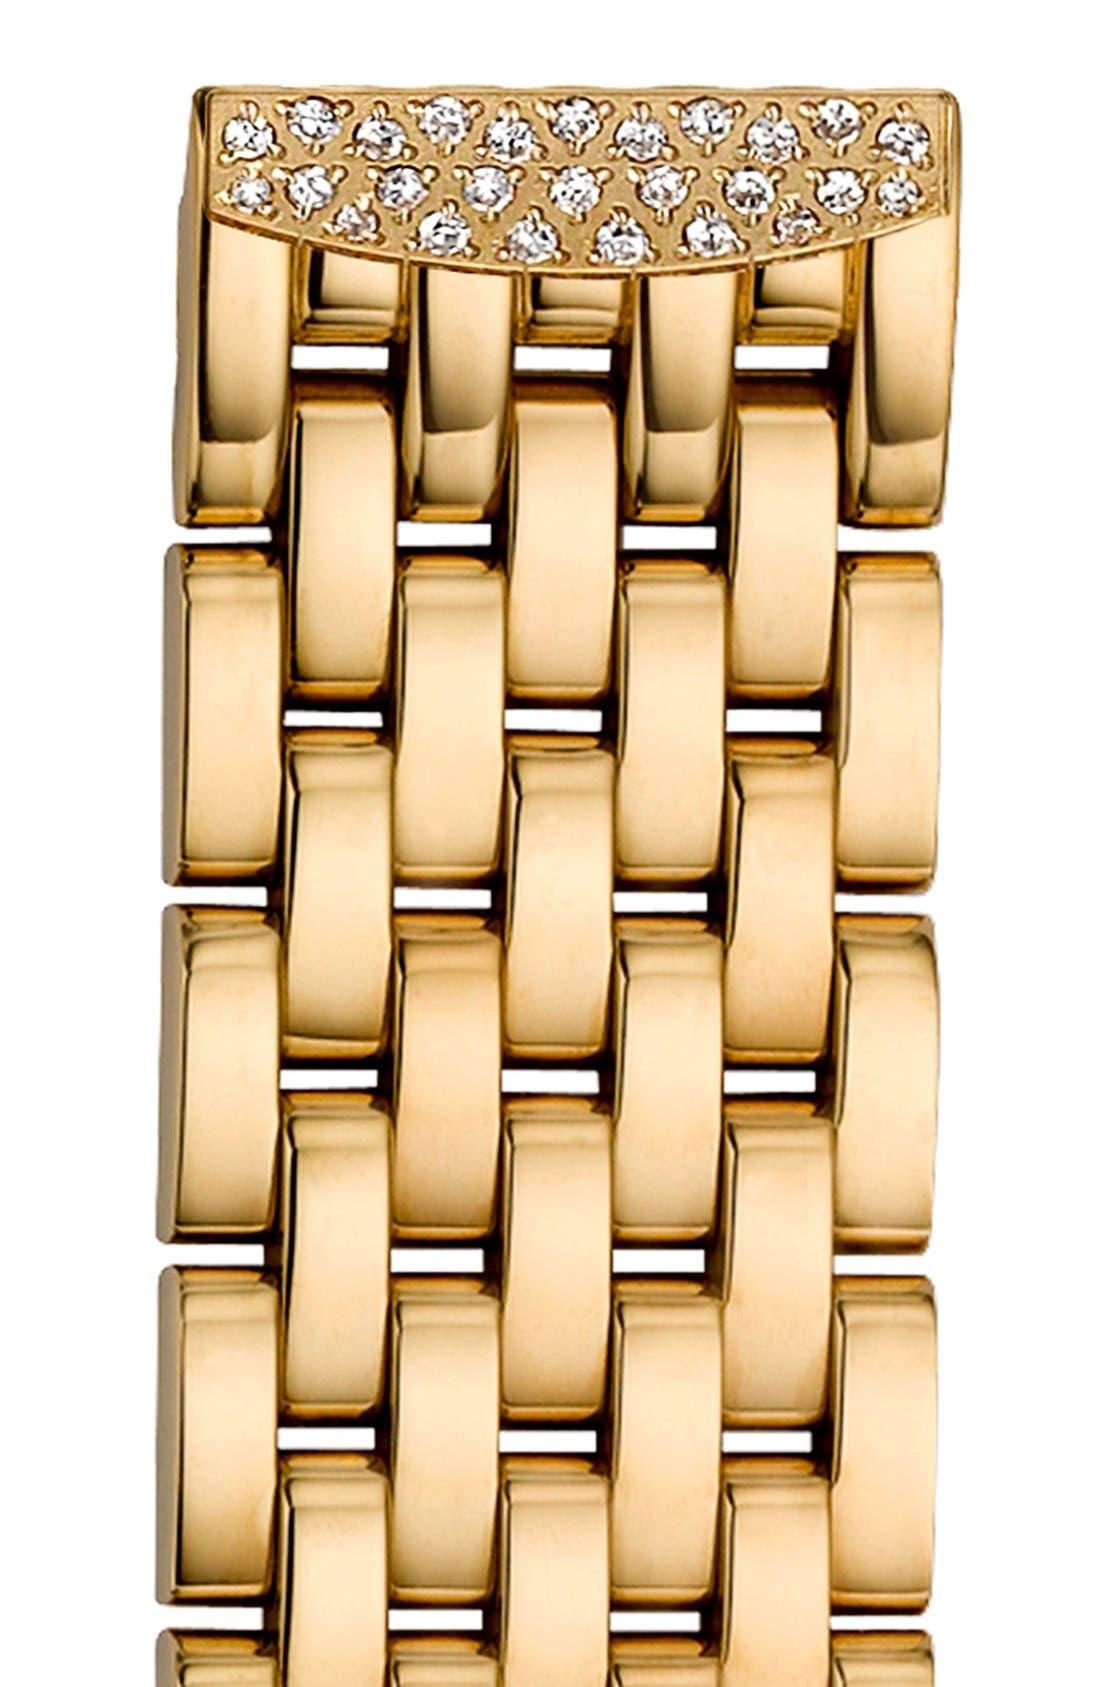 Alternate Image 1 Selected - MICHELE 'Urban Mini Diamond' 16mm Gold Plated Bracelet Watchband